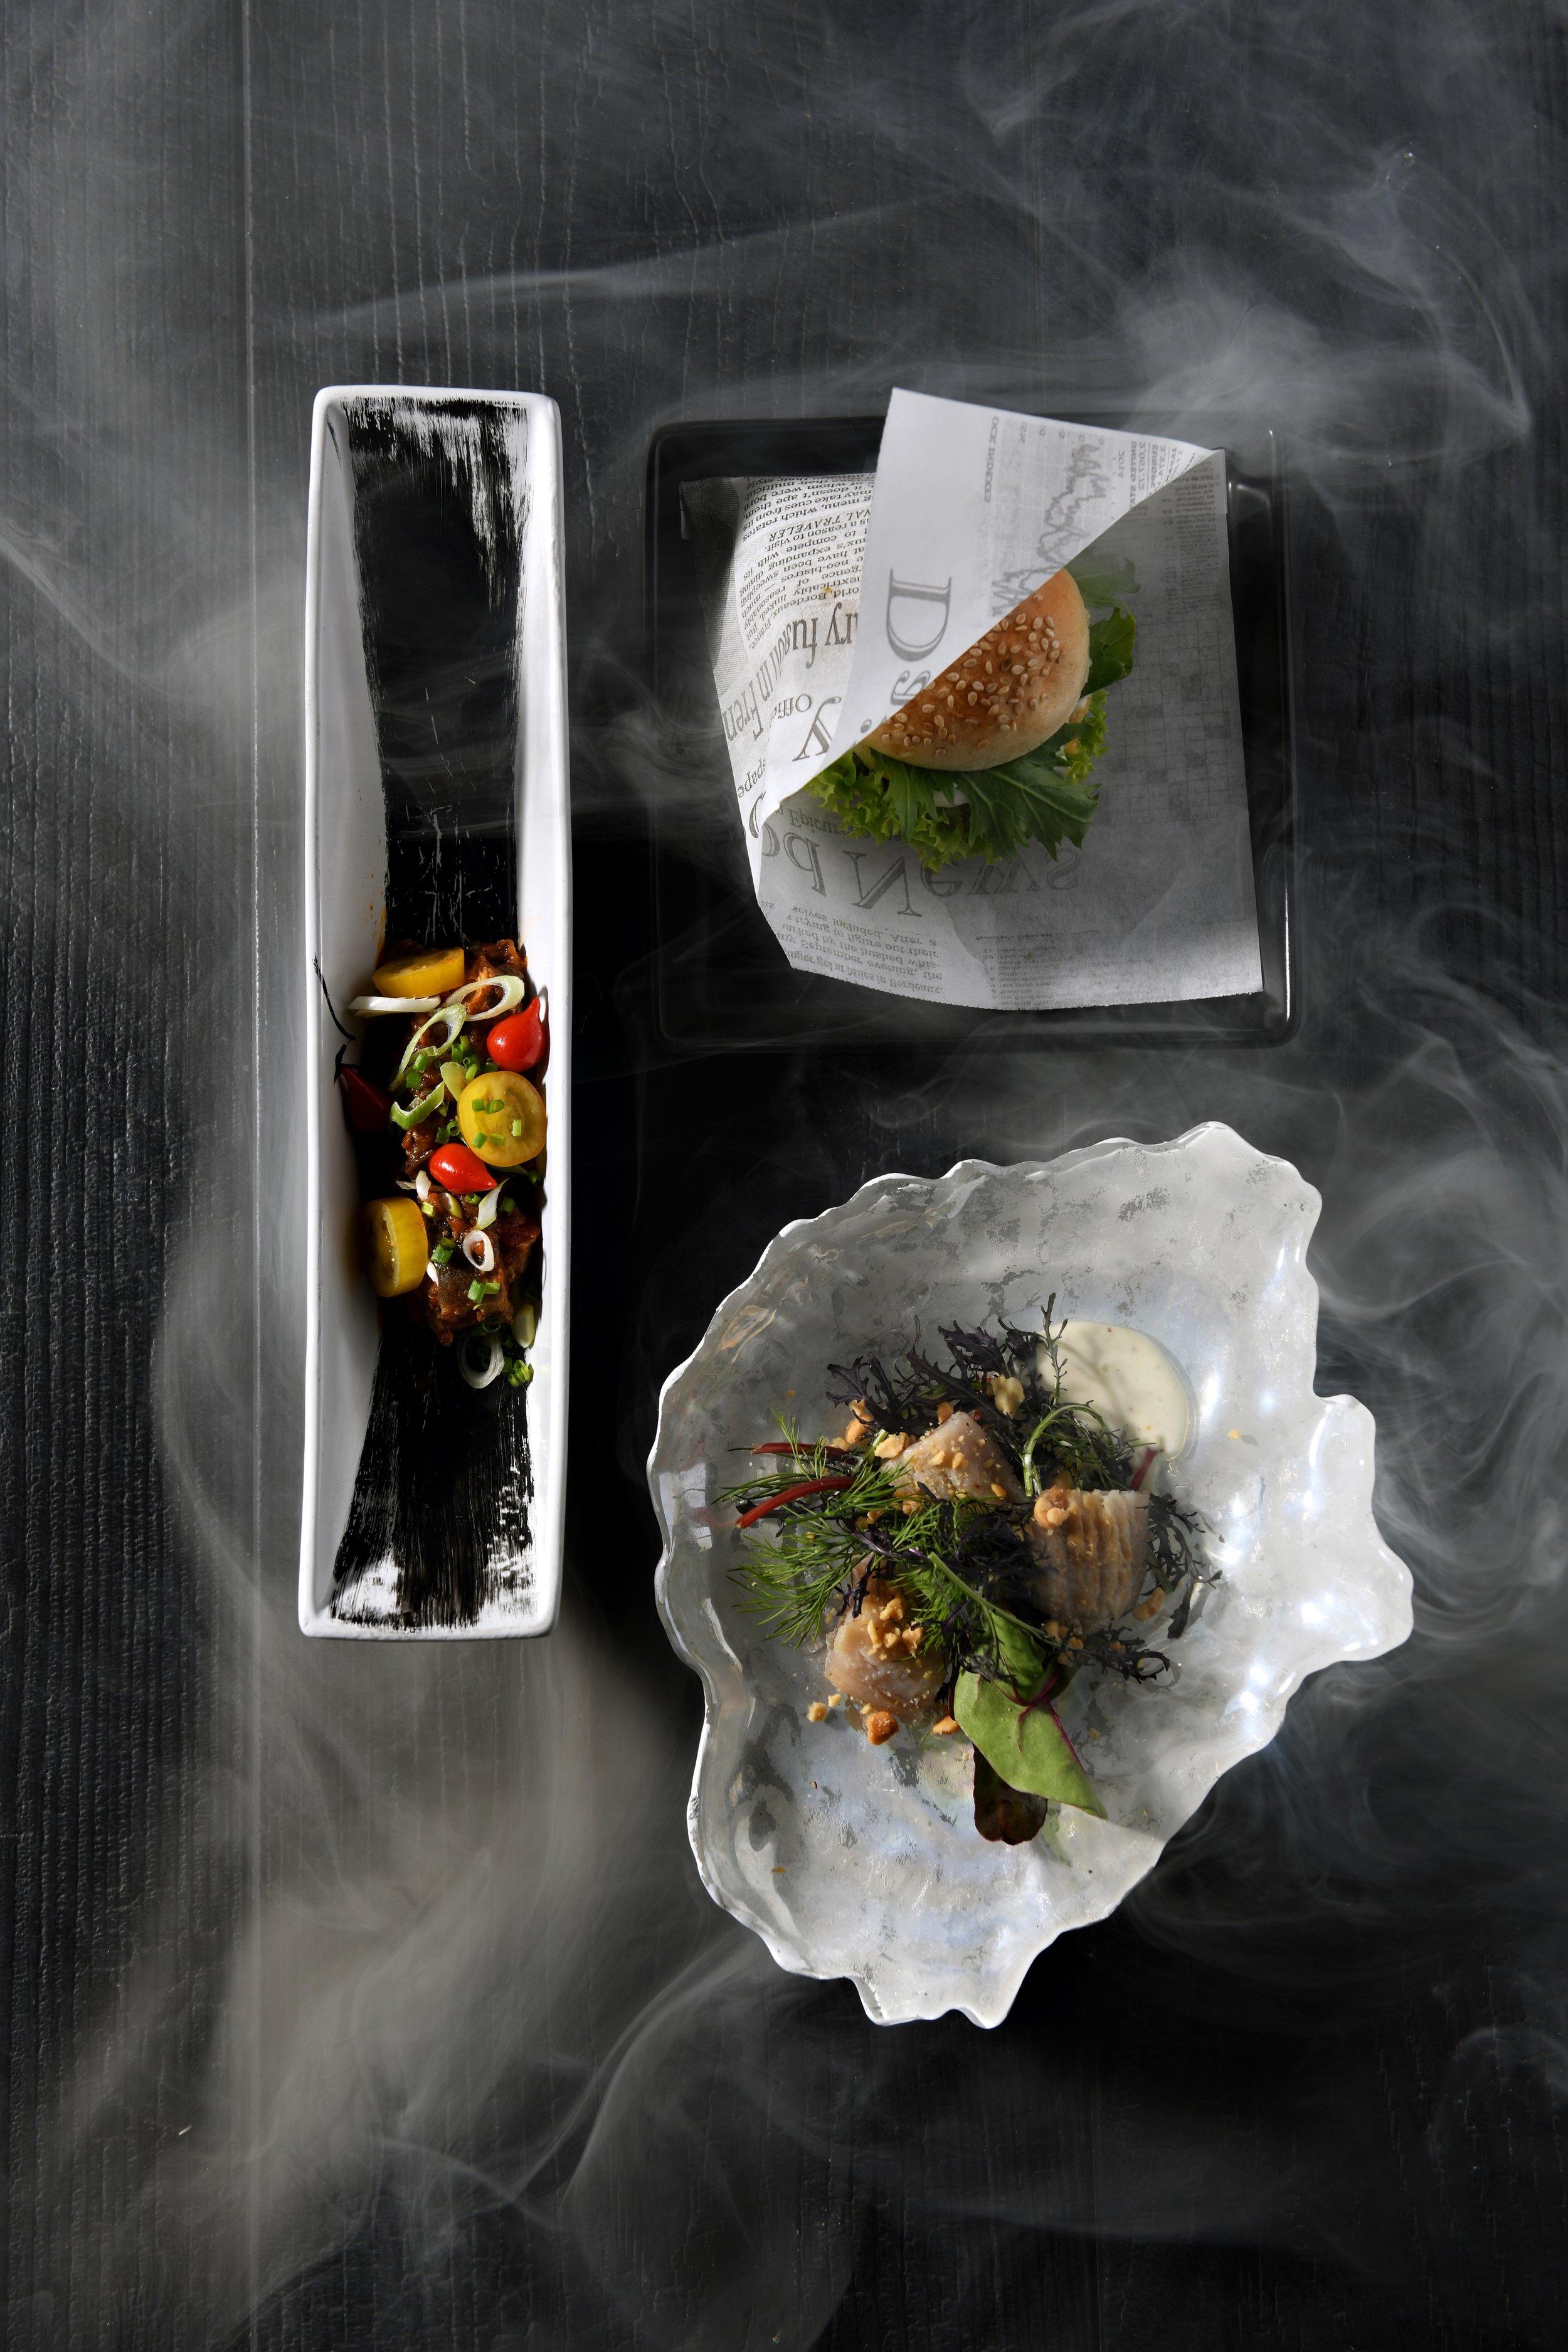 14 restaurant brasserie oud notarishuis ninove bart albrecht tablefever .jpg